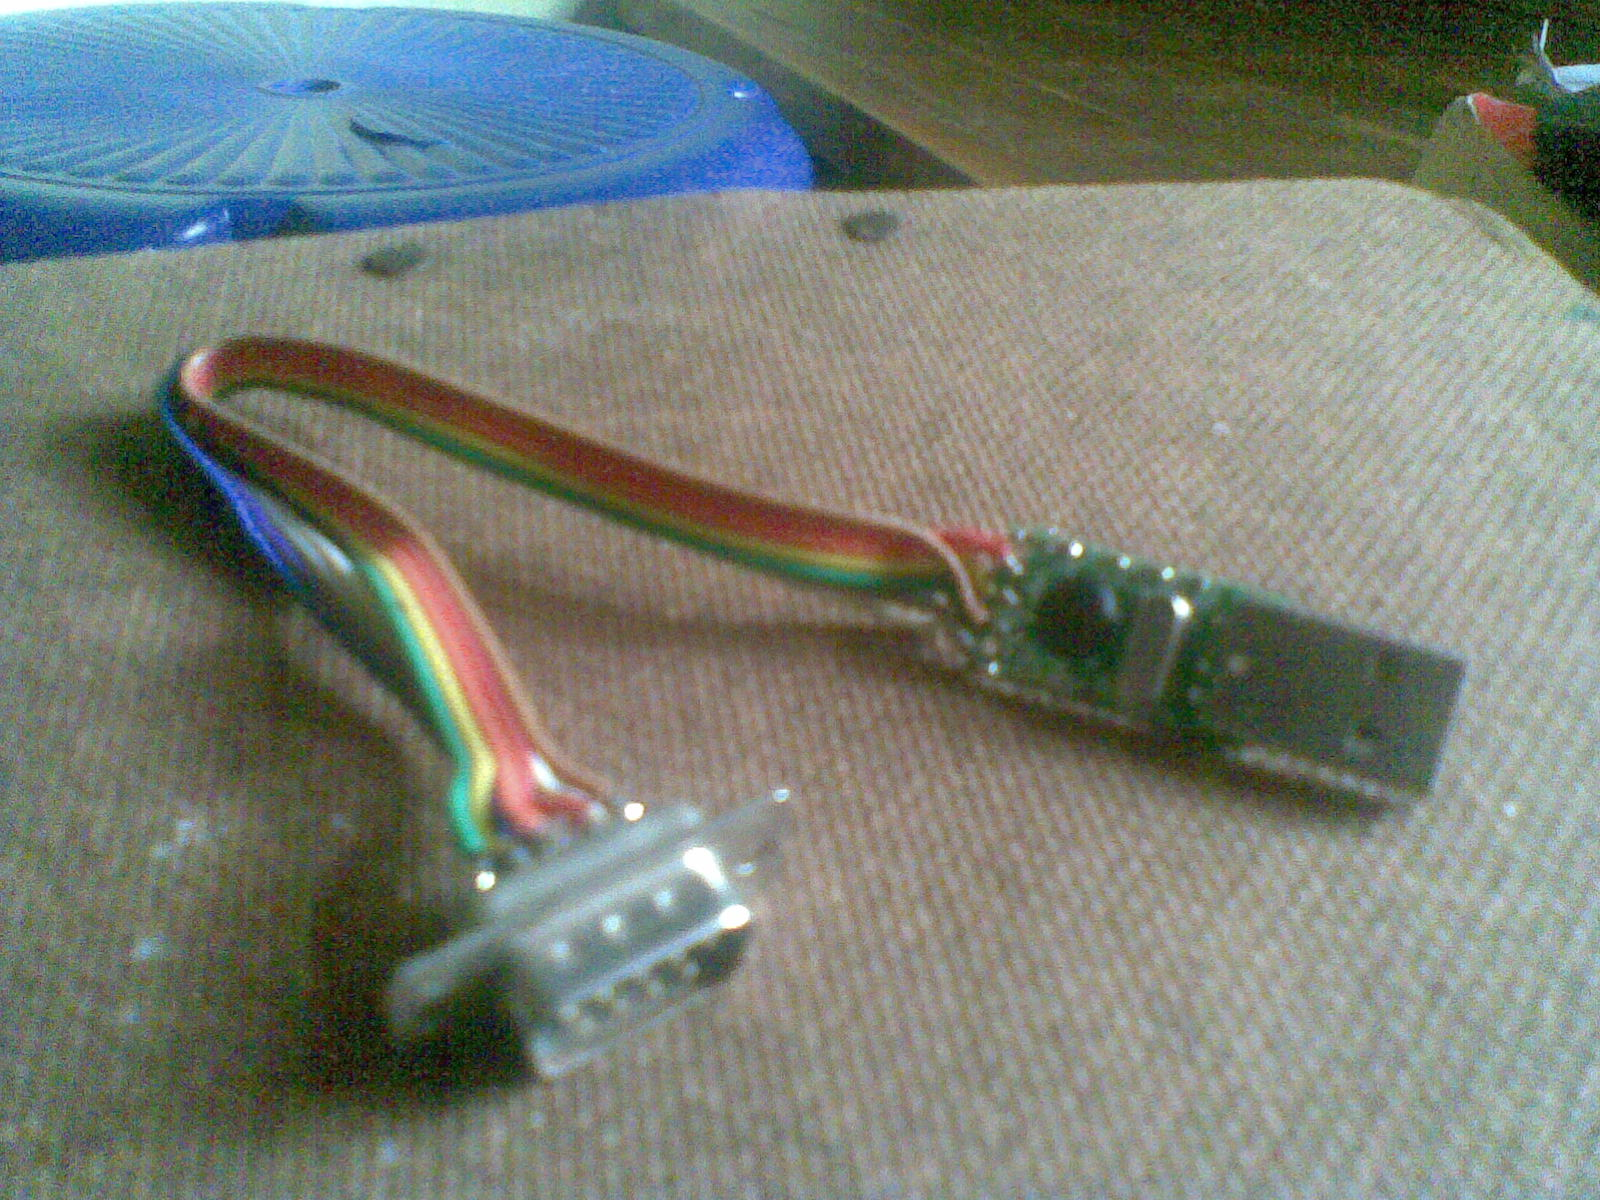 FTDI USB UART seriell Adapter für AVR PIC Projekt - TTL RS232 bet365 live stream bundesliga anleitung | eBay